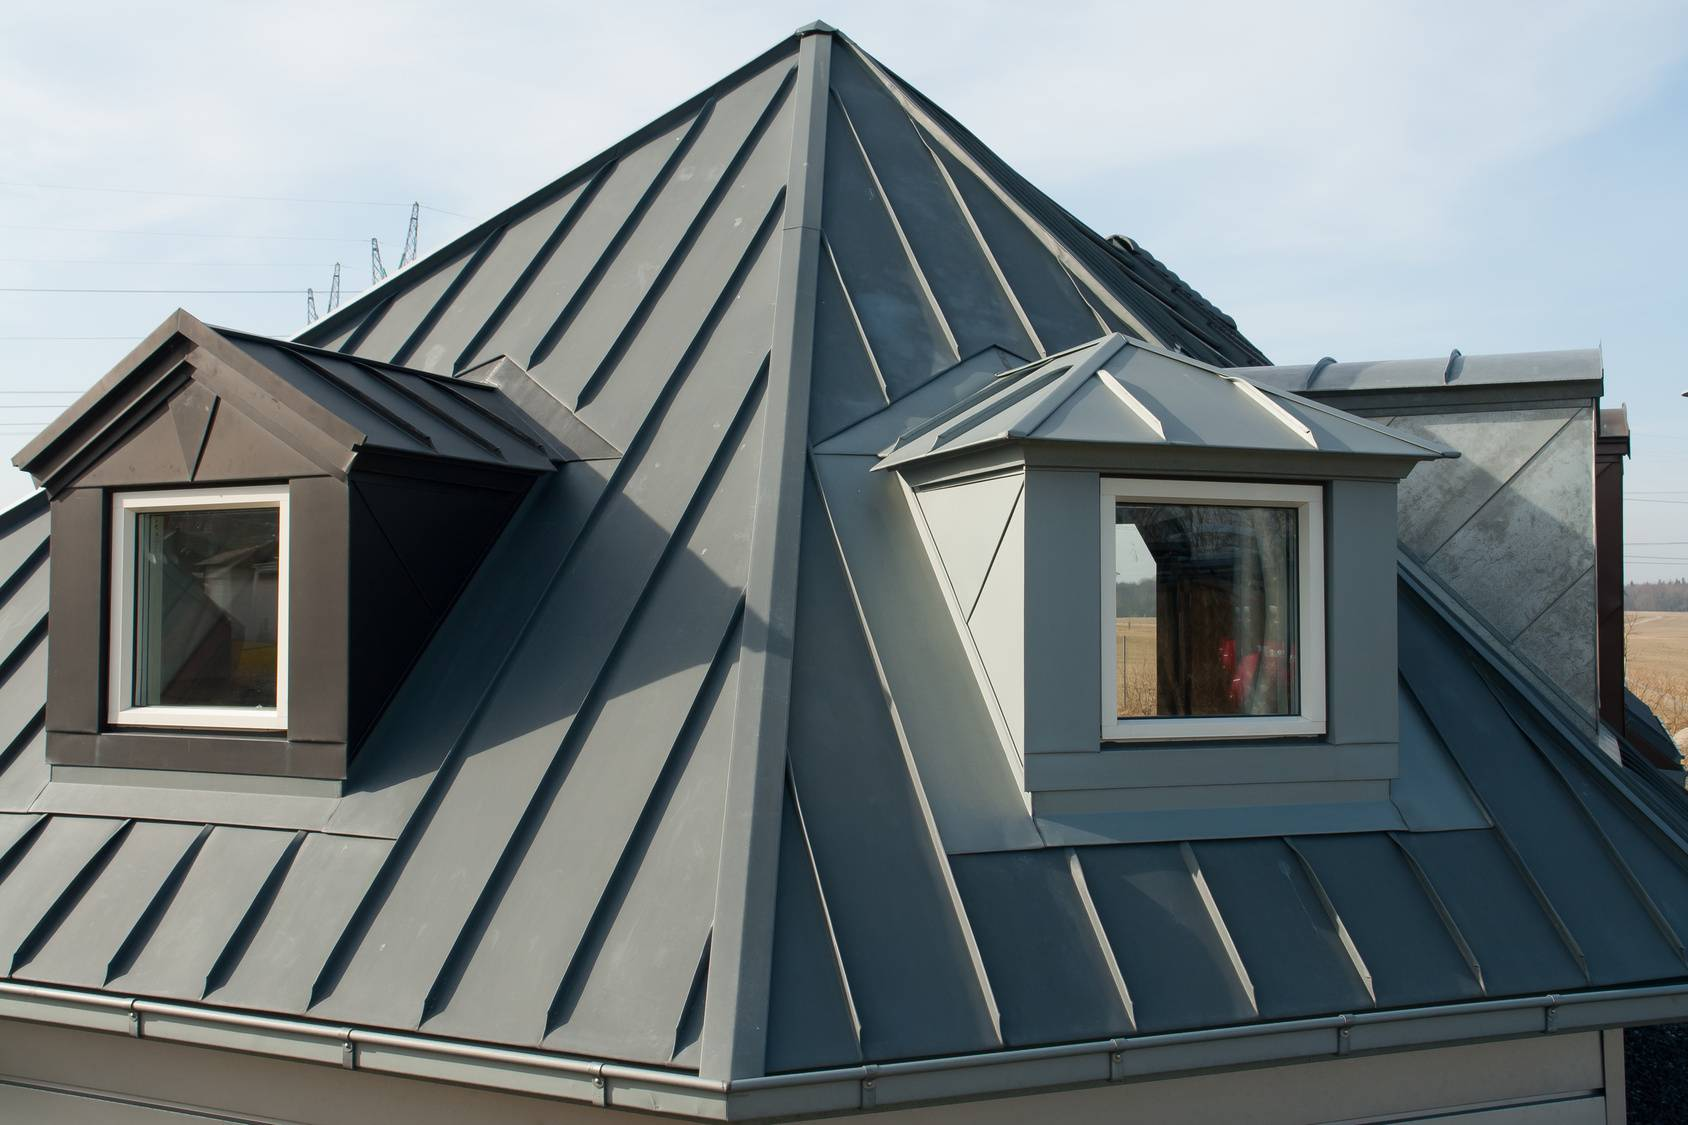 Etancheite des toitures metalliques